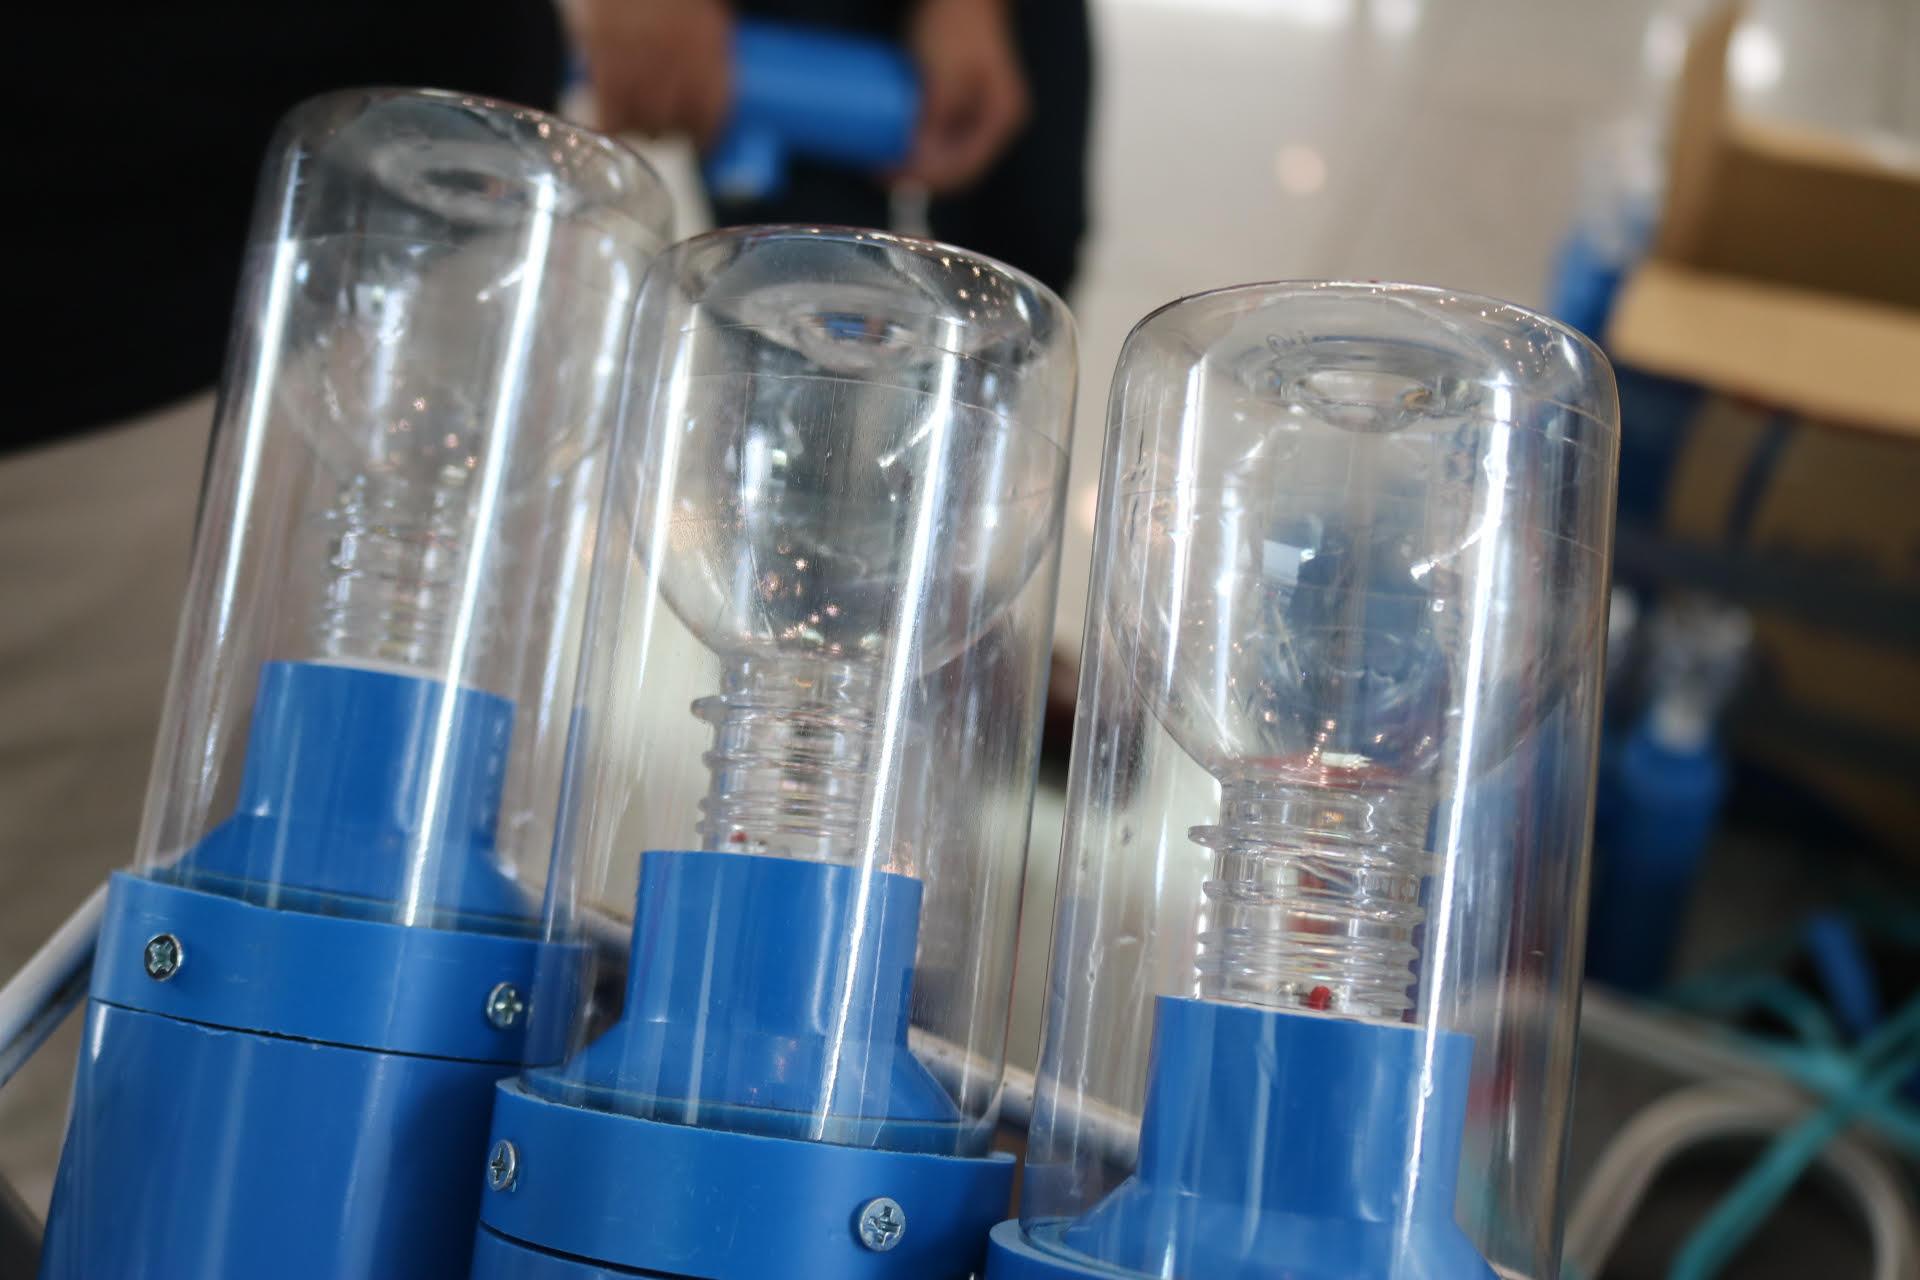 AirAsia Liter of Light brought lamps to Zamboanga